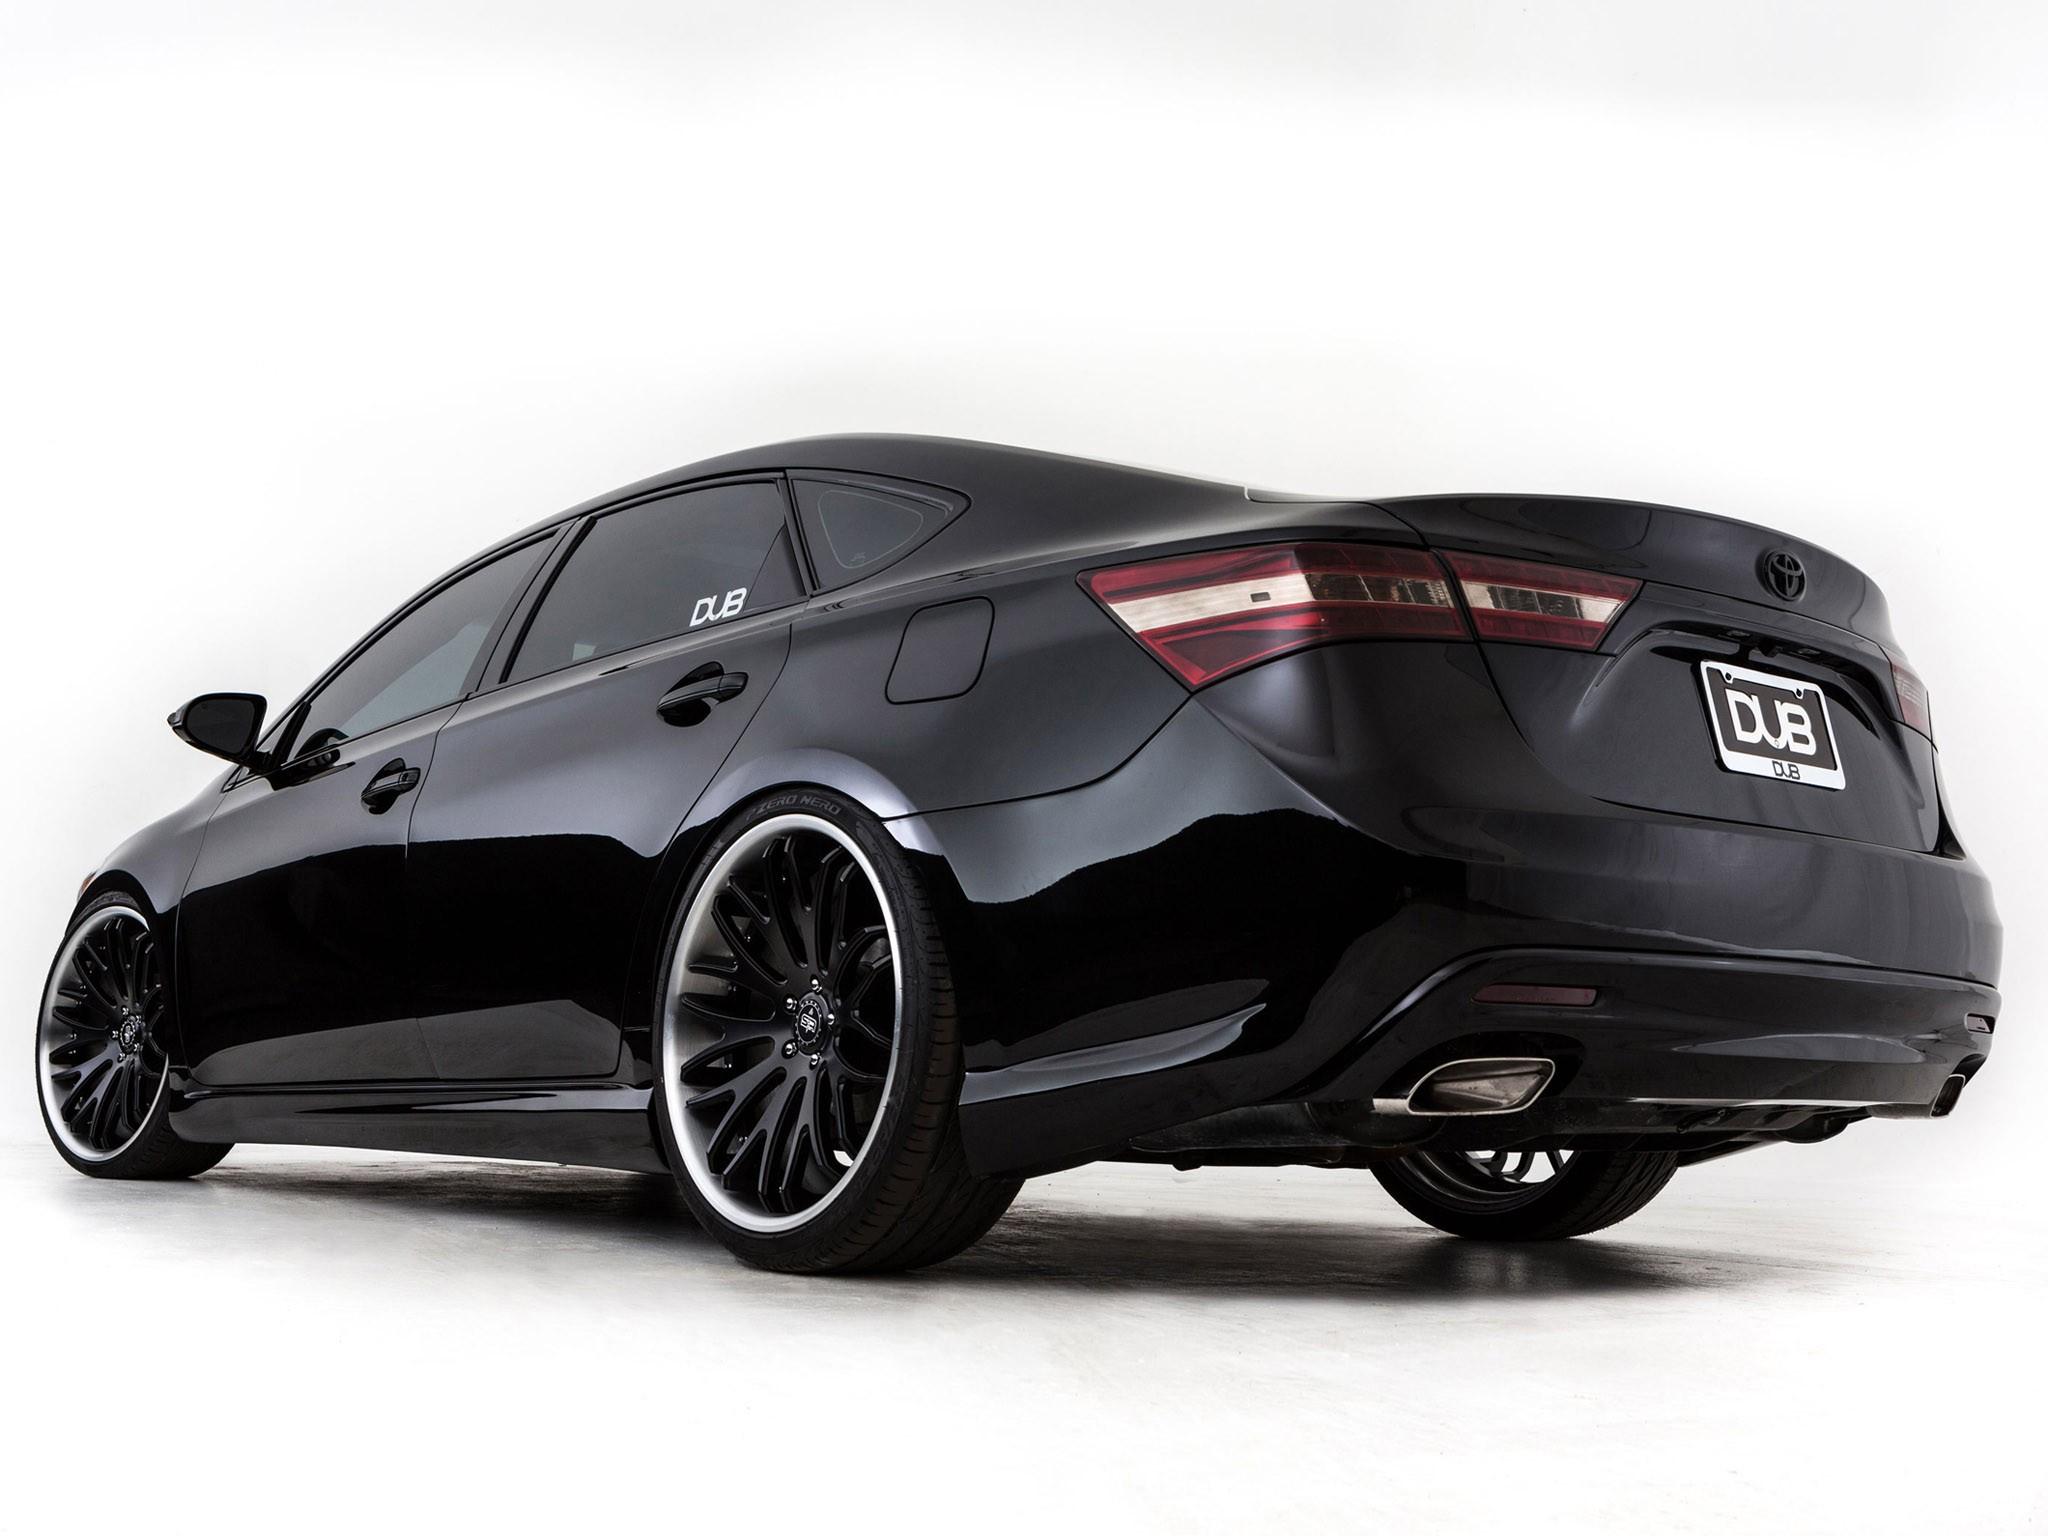 2012 Toyota Avalon Dub Edition